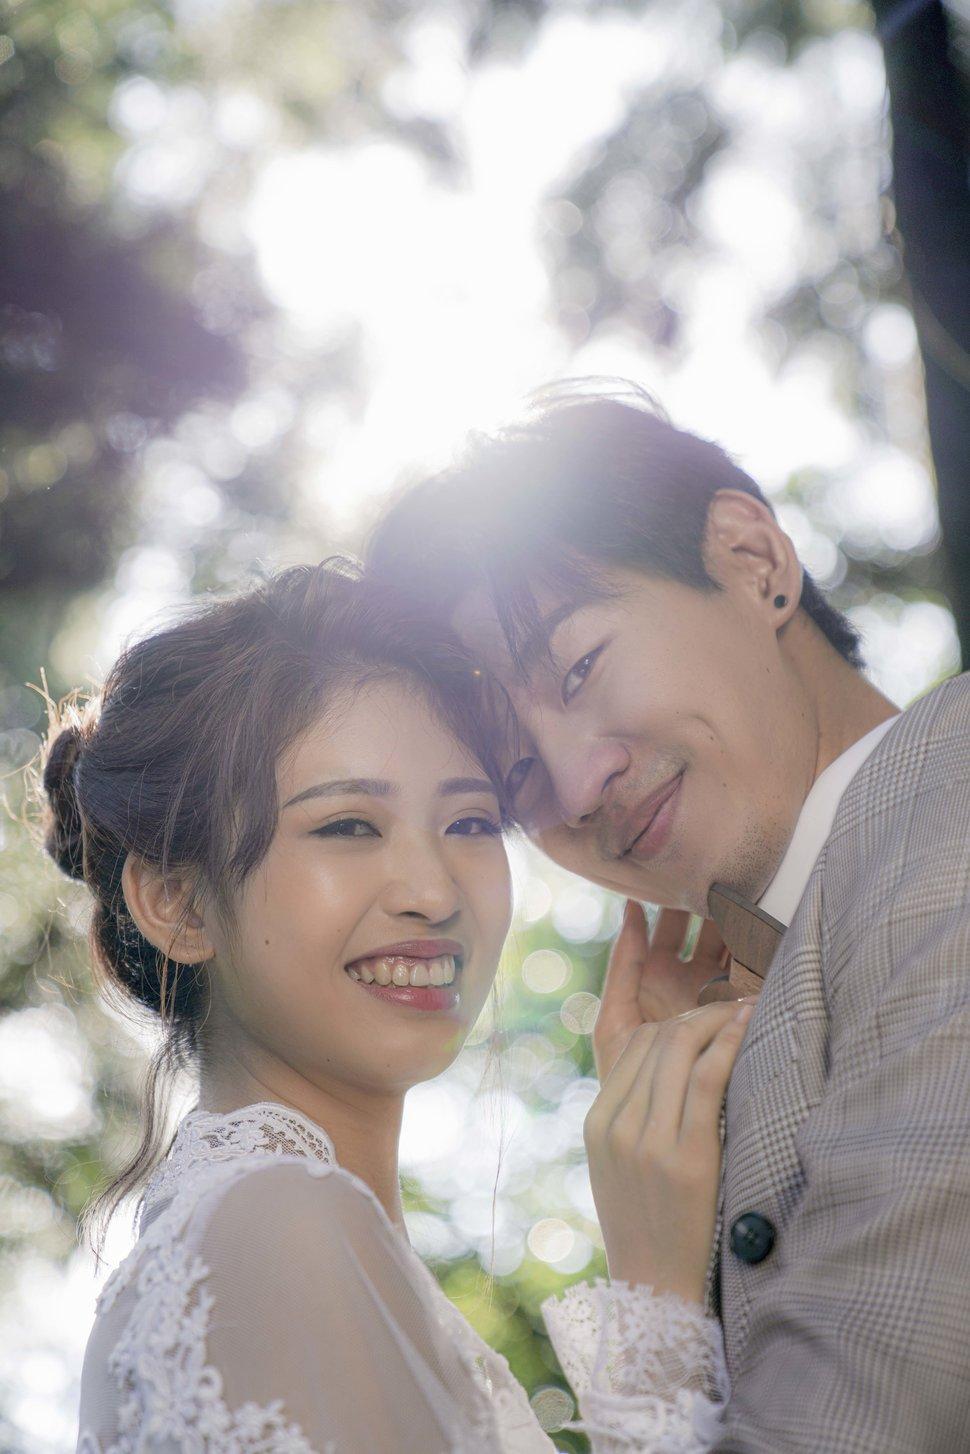 GM_06769 - GM俊彥 uxrw art studio - 結婚吧